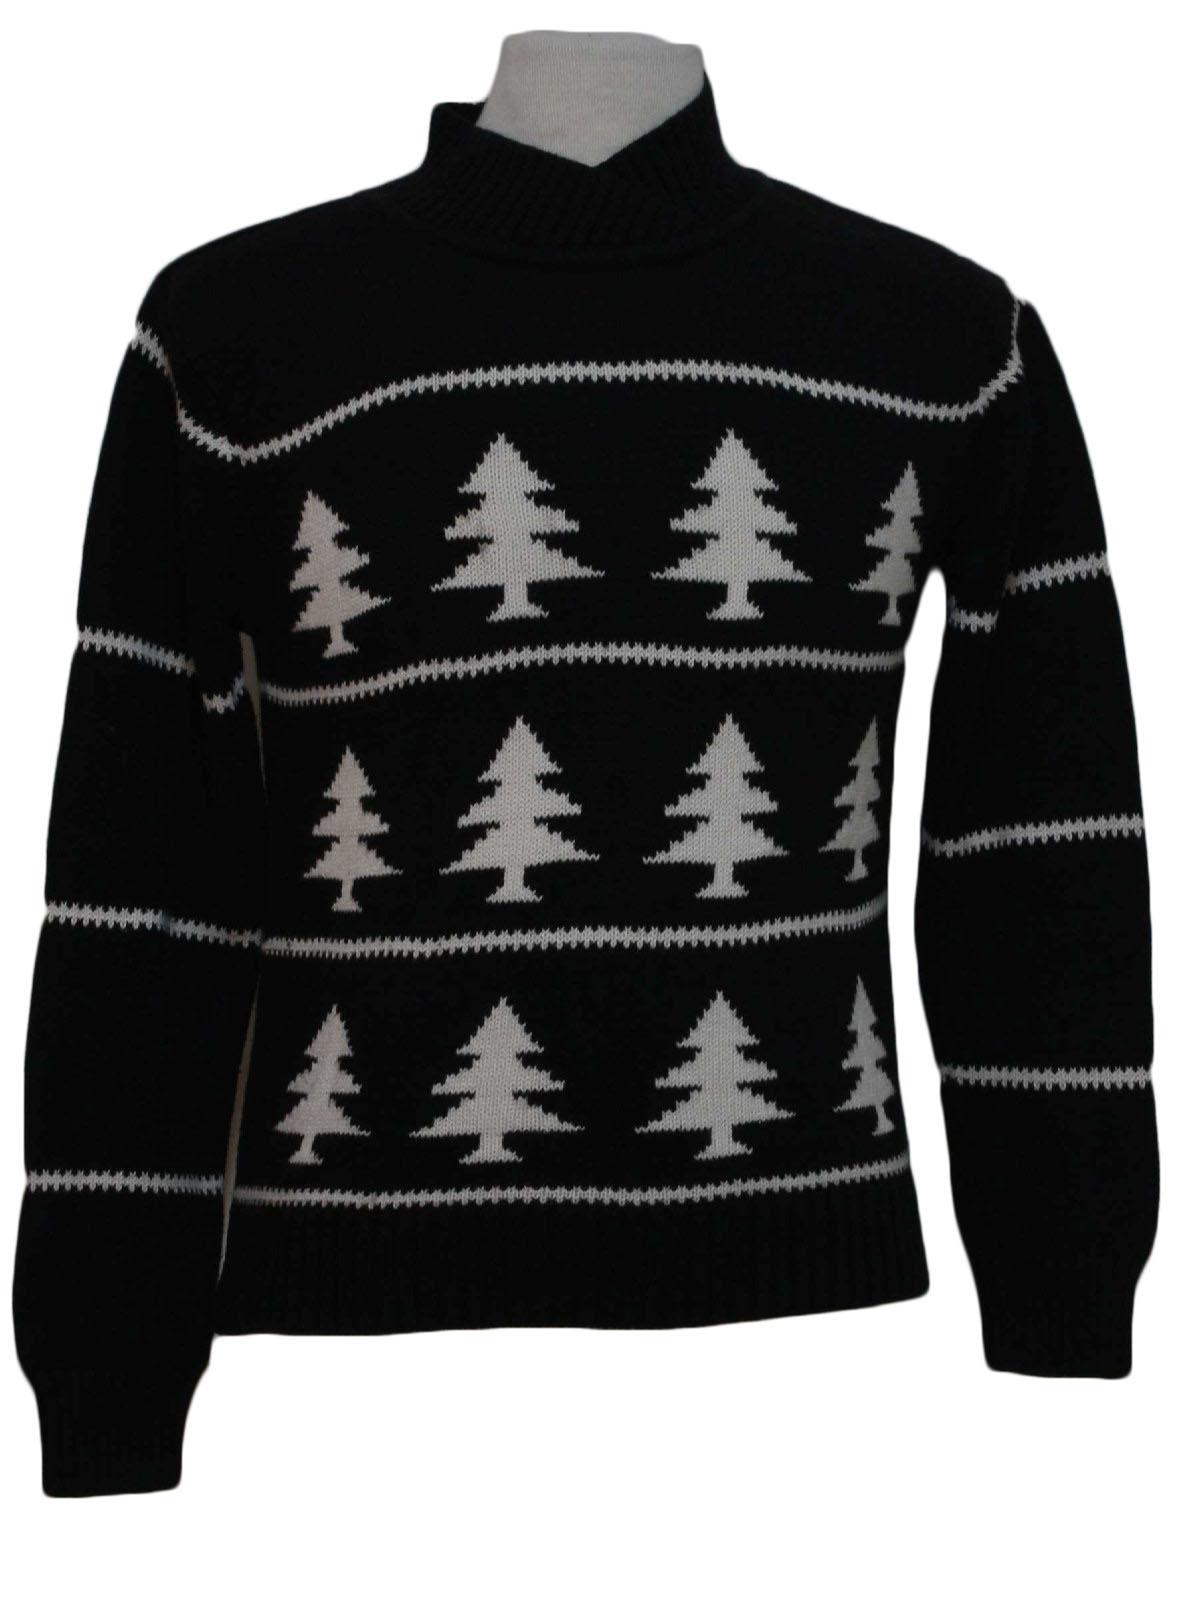 Moose Cute Minimalist Wallpaper Blizzard Bay Mens Unicorn Ugly Christmas Sweater Redwhite